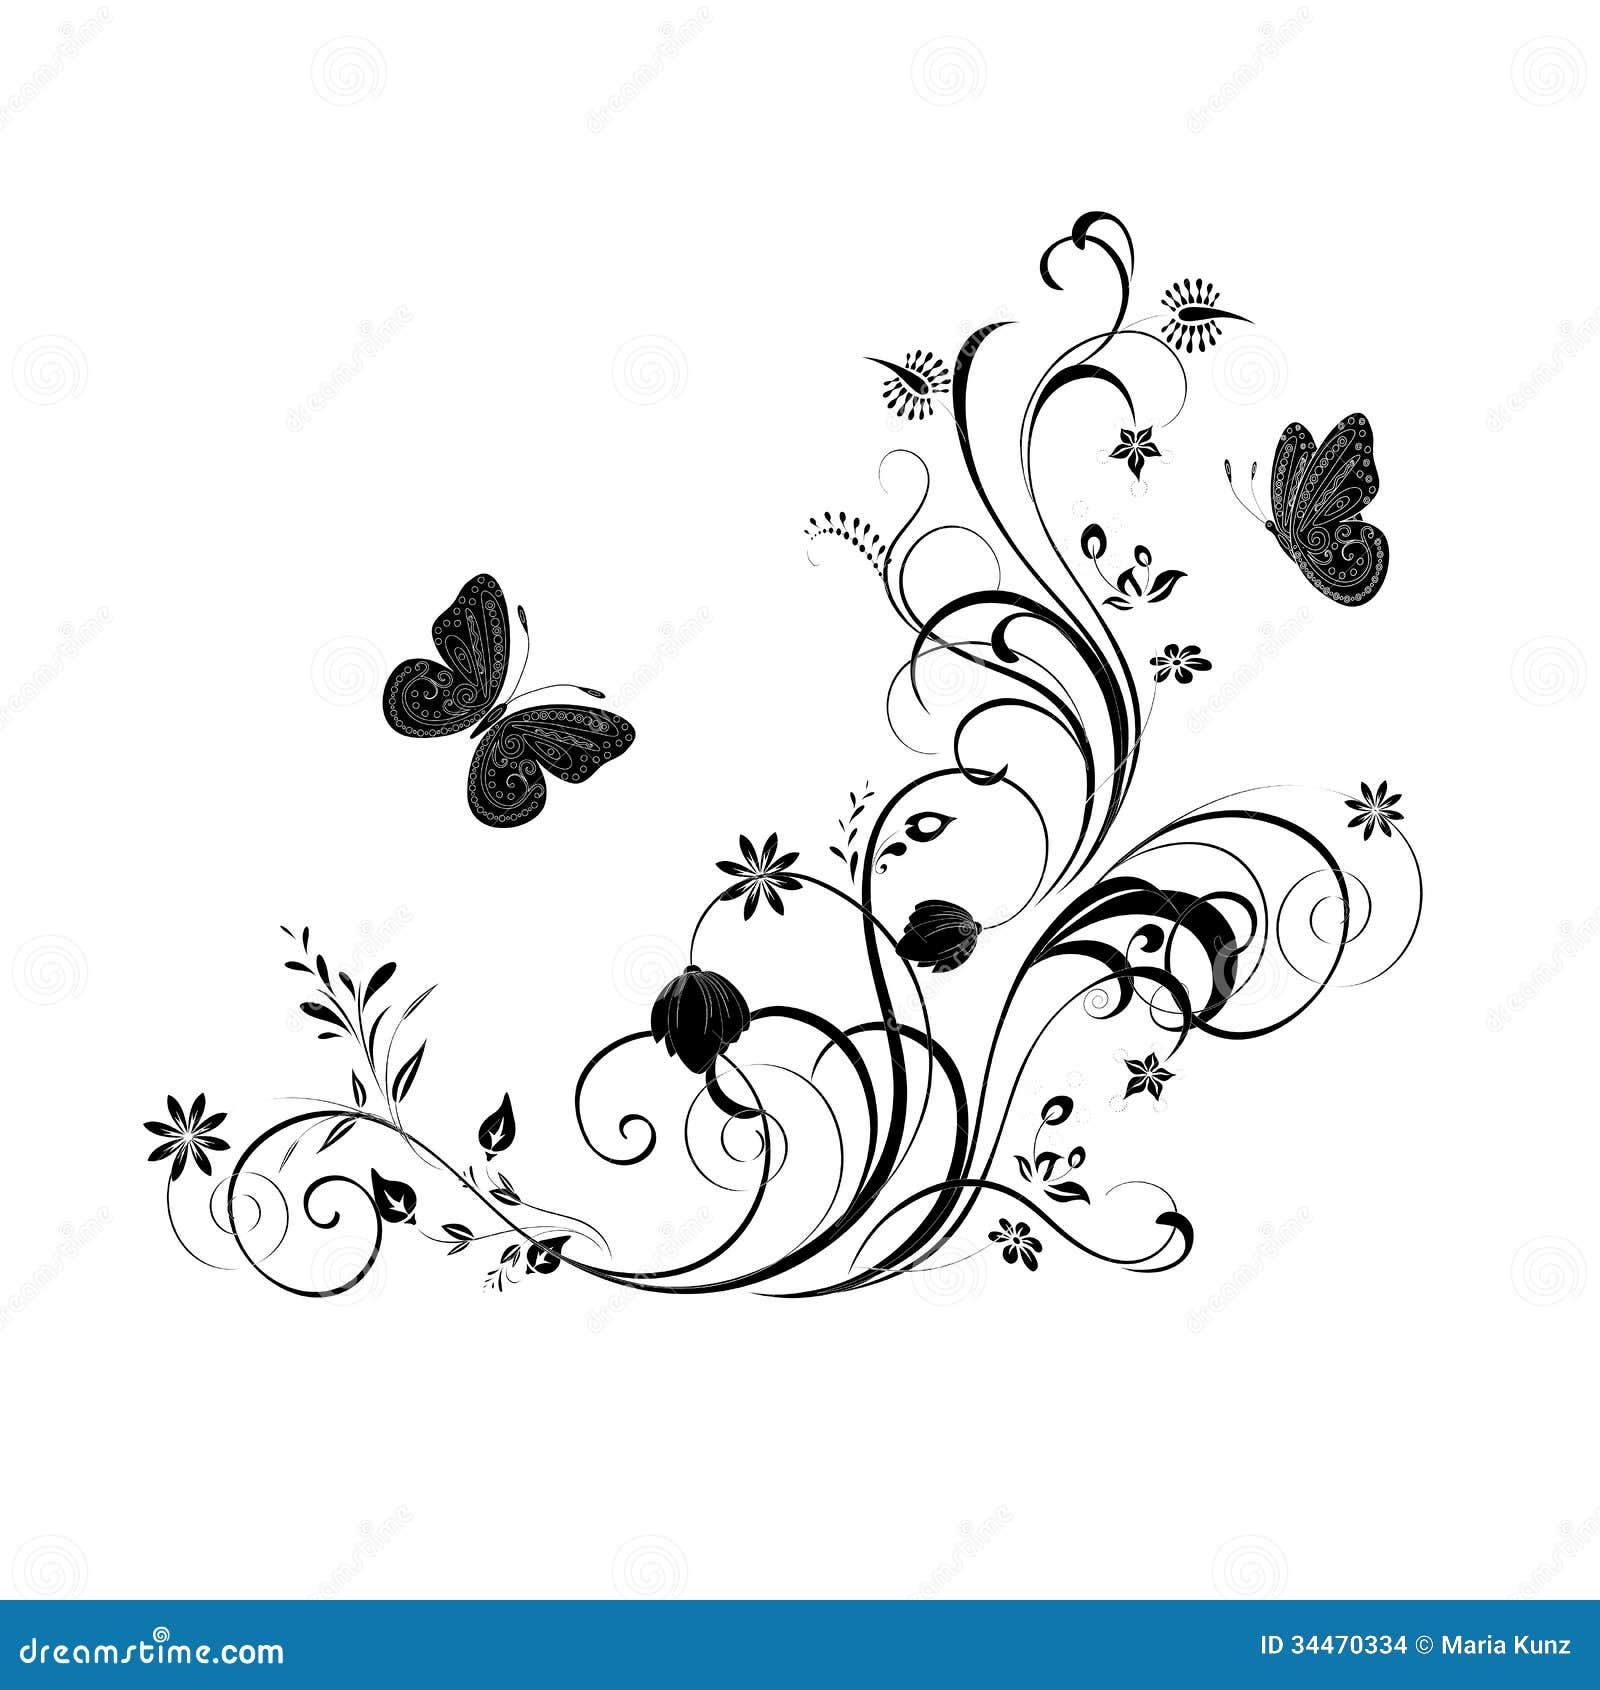 Decorative Ornament Stock Images - Image: 34470334